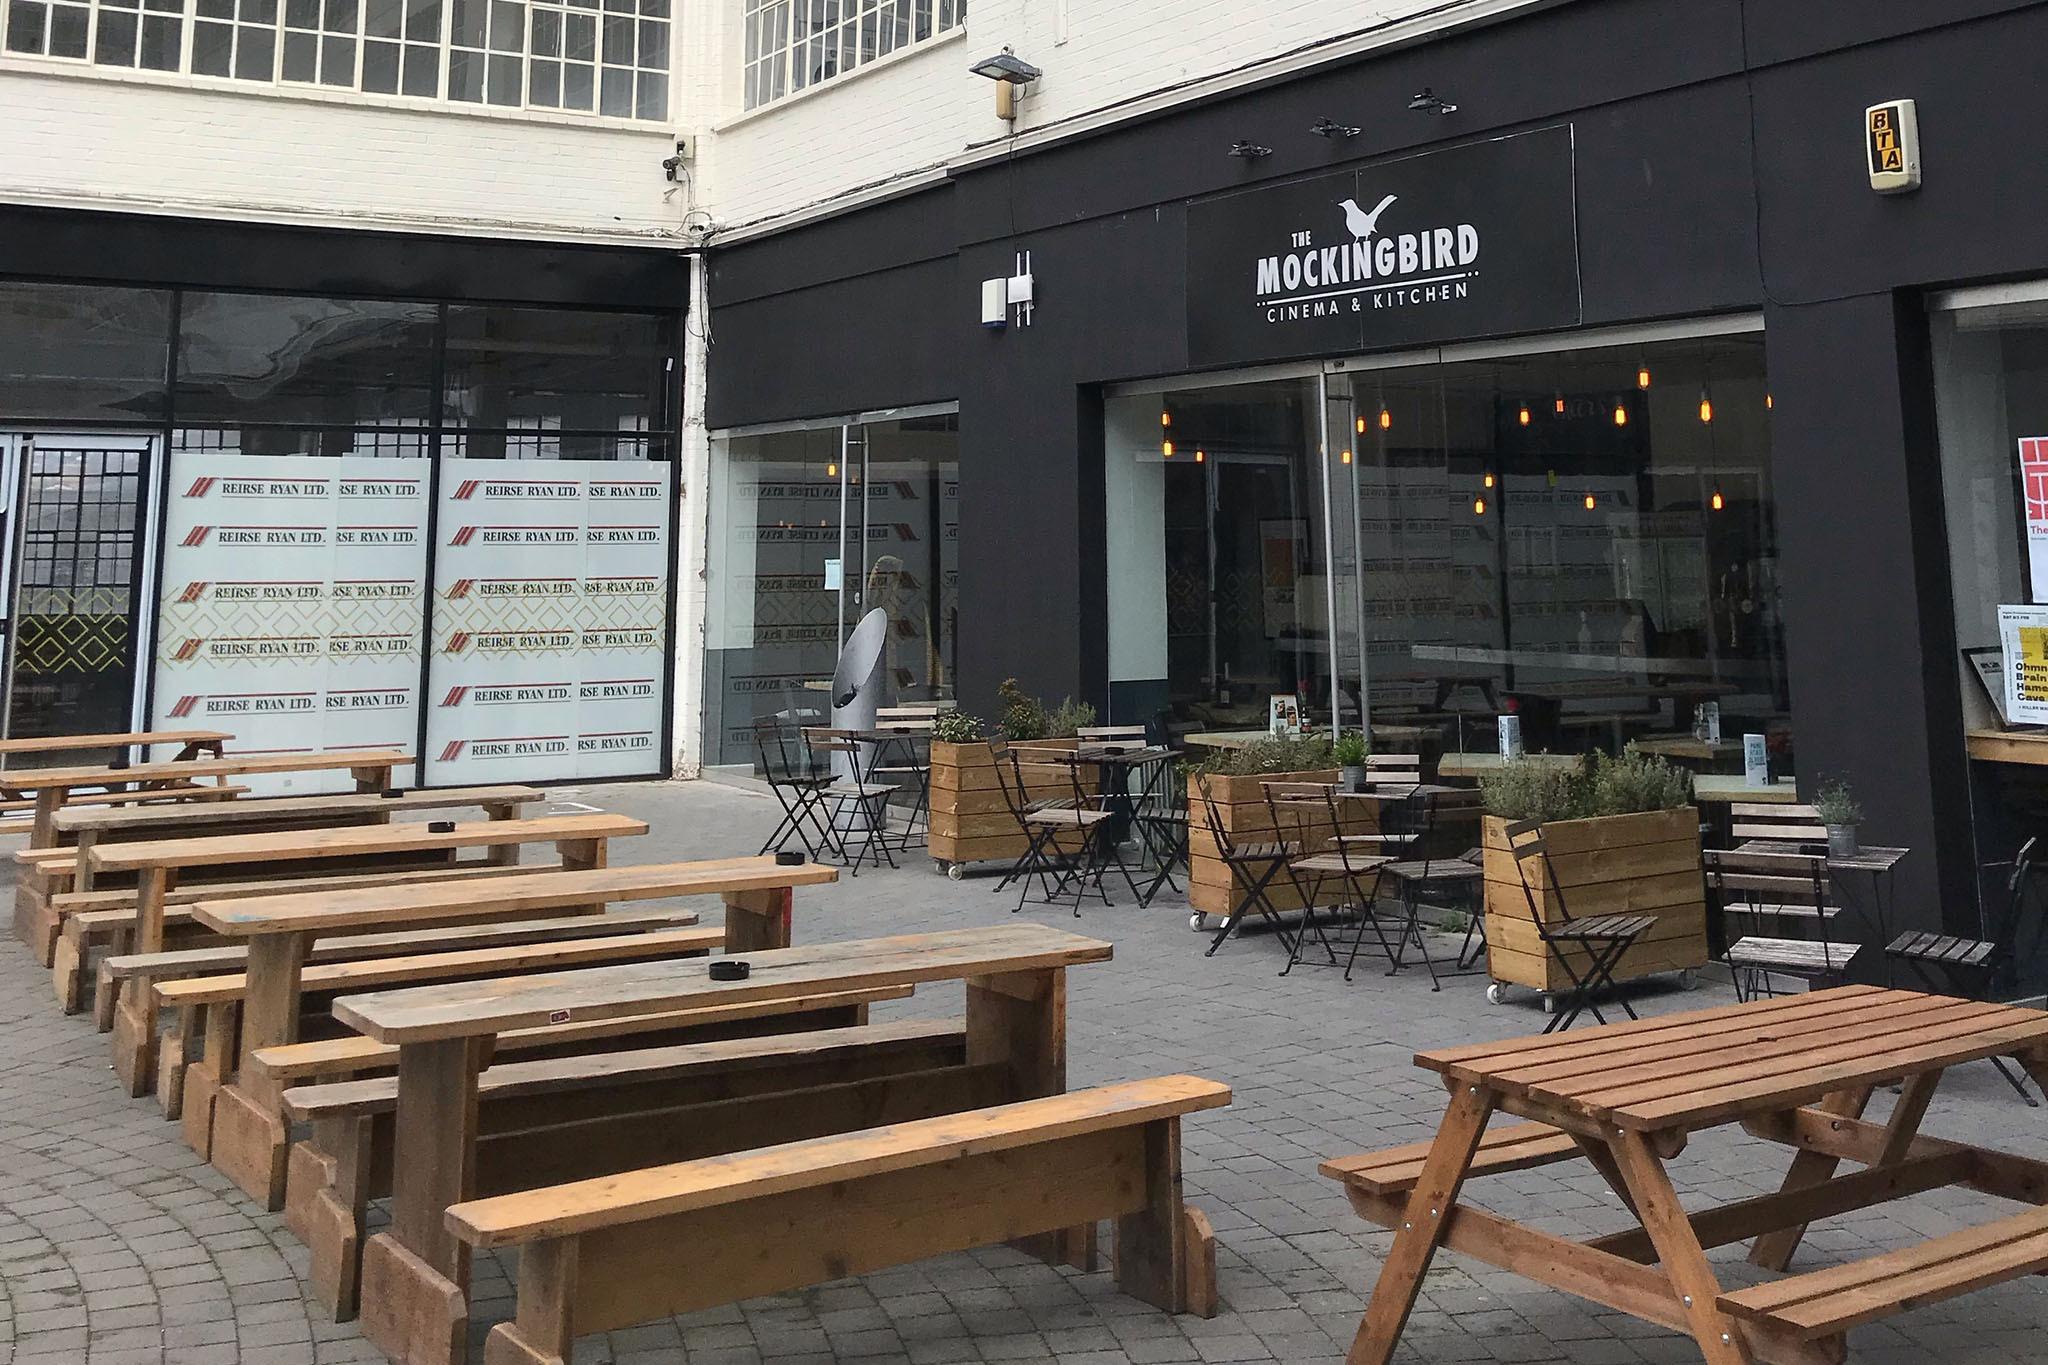 The Mockingbird Cinema and Kitchen